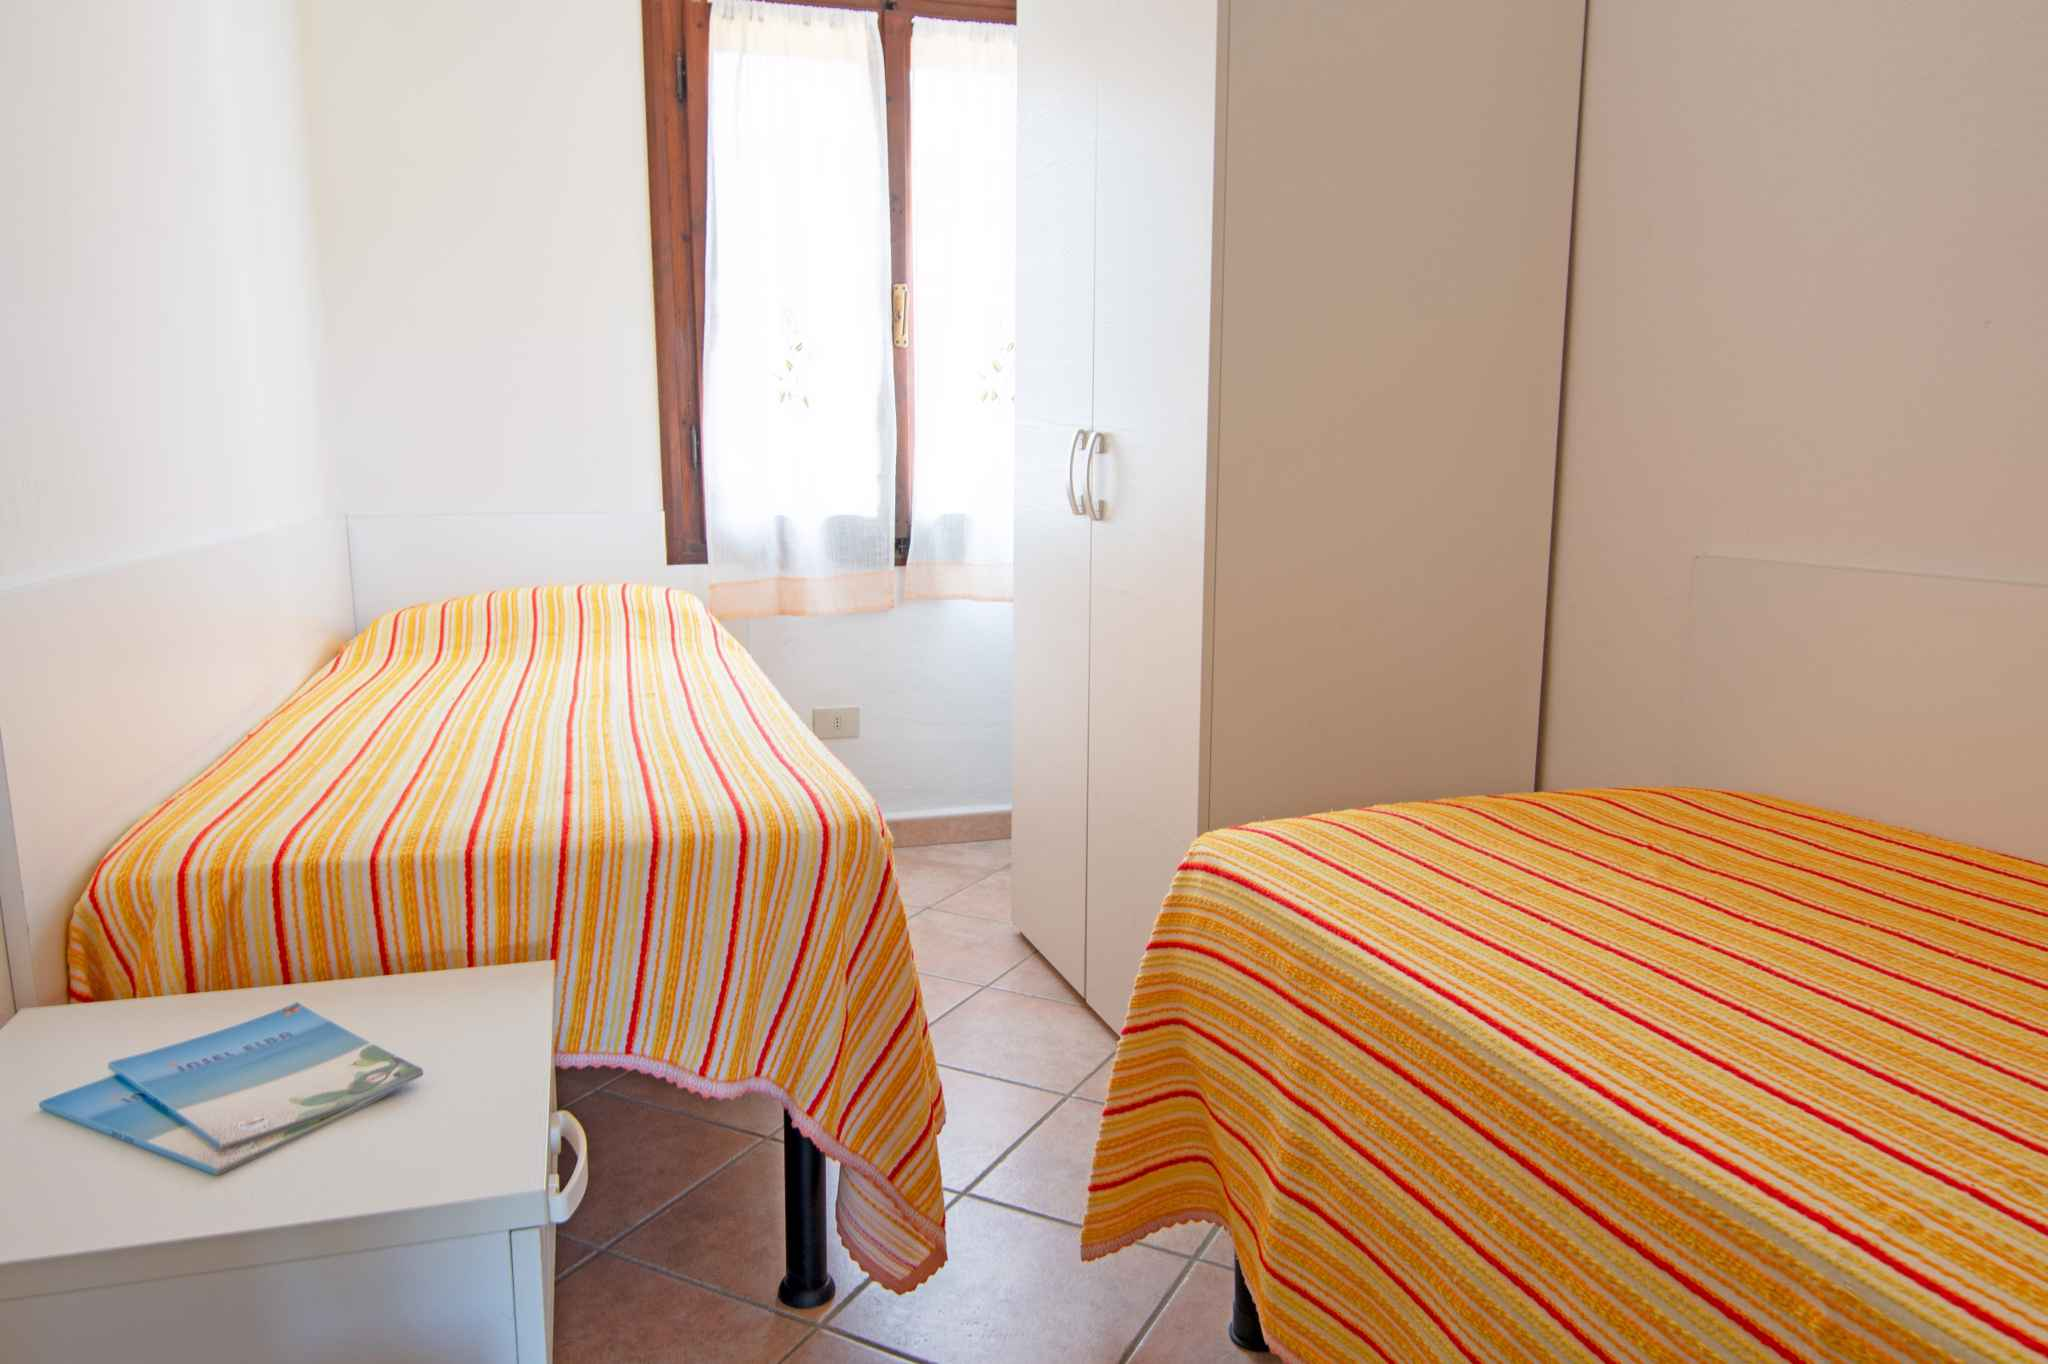 Ferienwohnung mit Panoramablick (404925), Capoliveri, Elba, Toskana, Italien, Bild 19